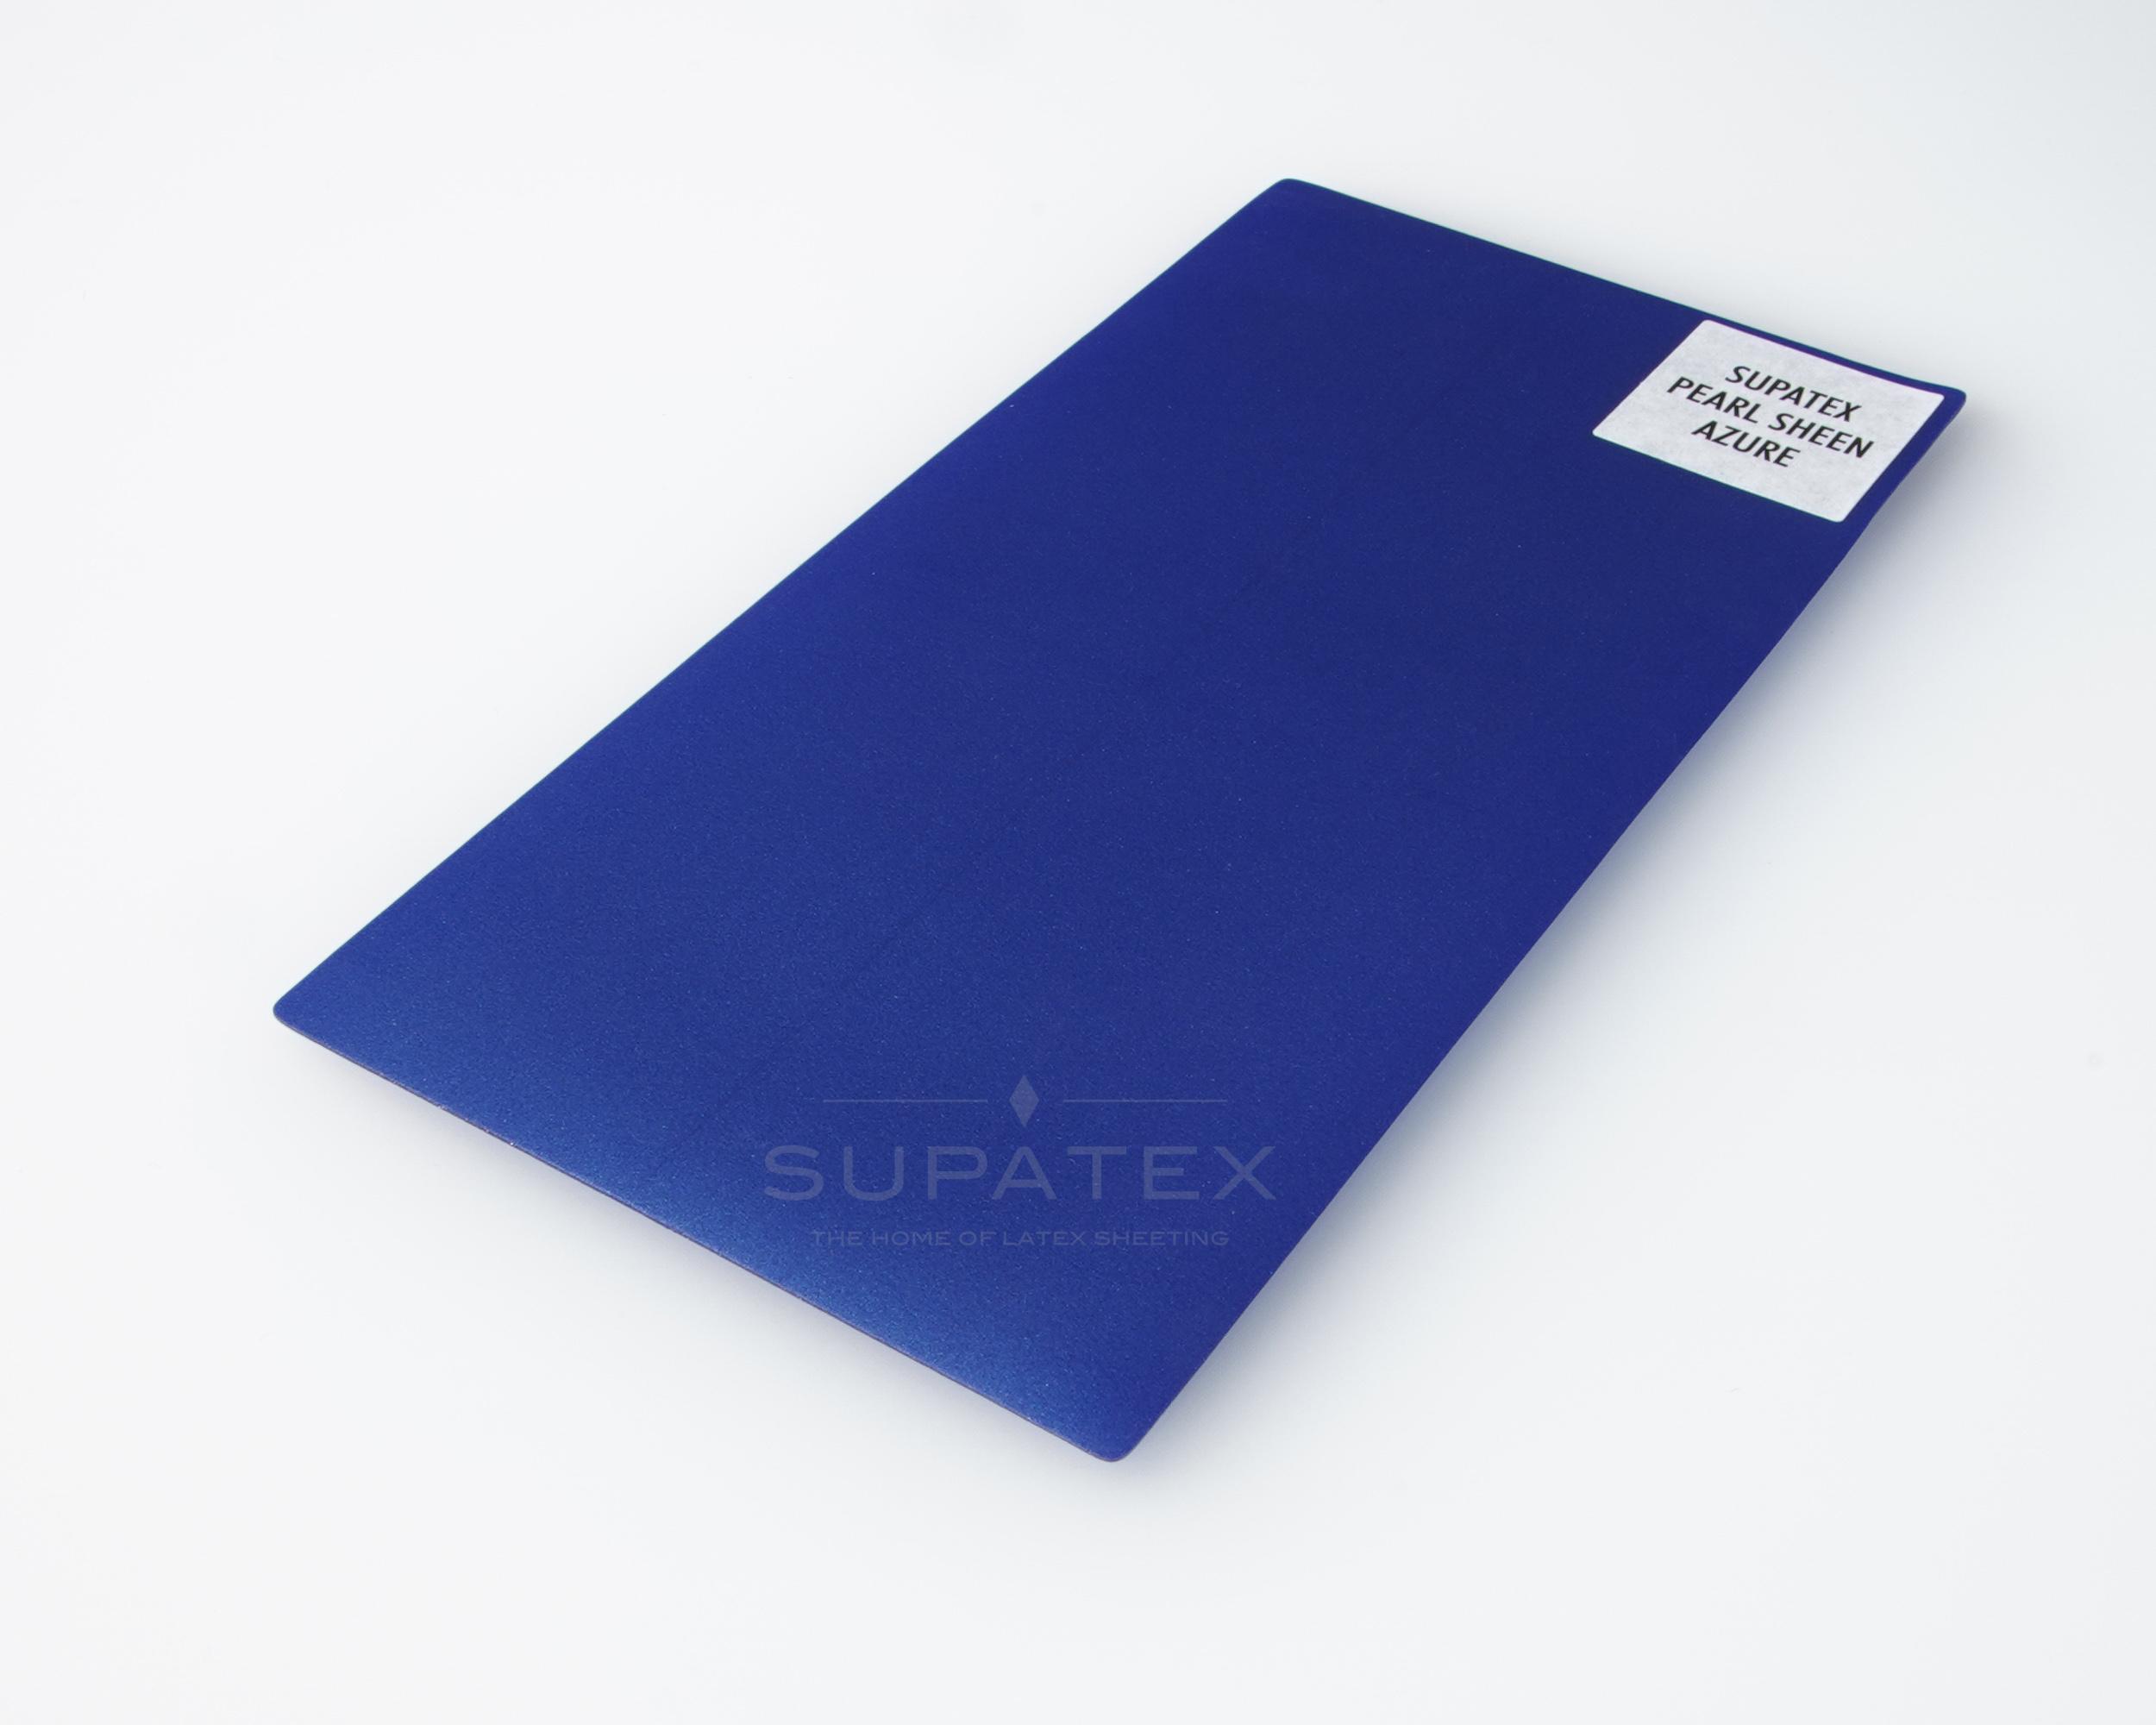 Supatex Pearlsheen Azure 0.33 mm